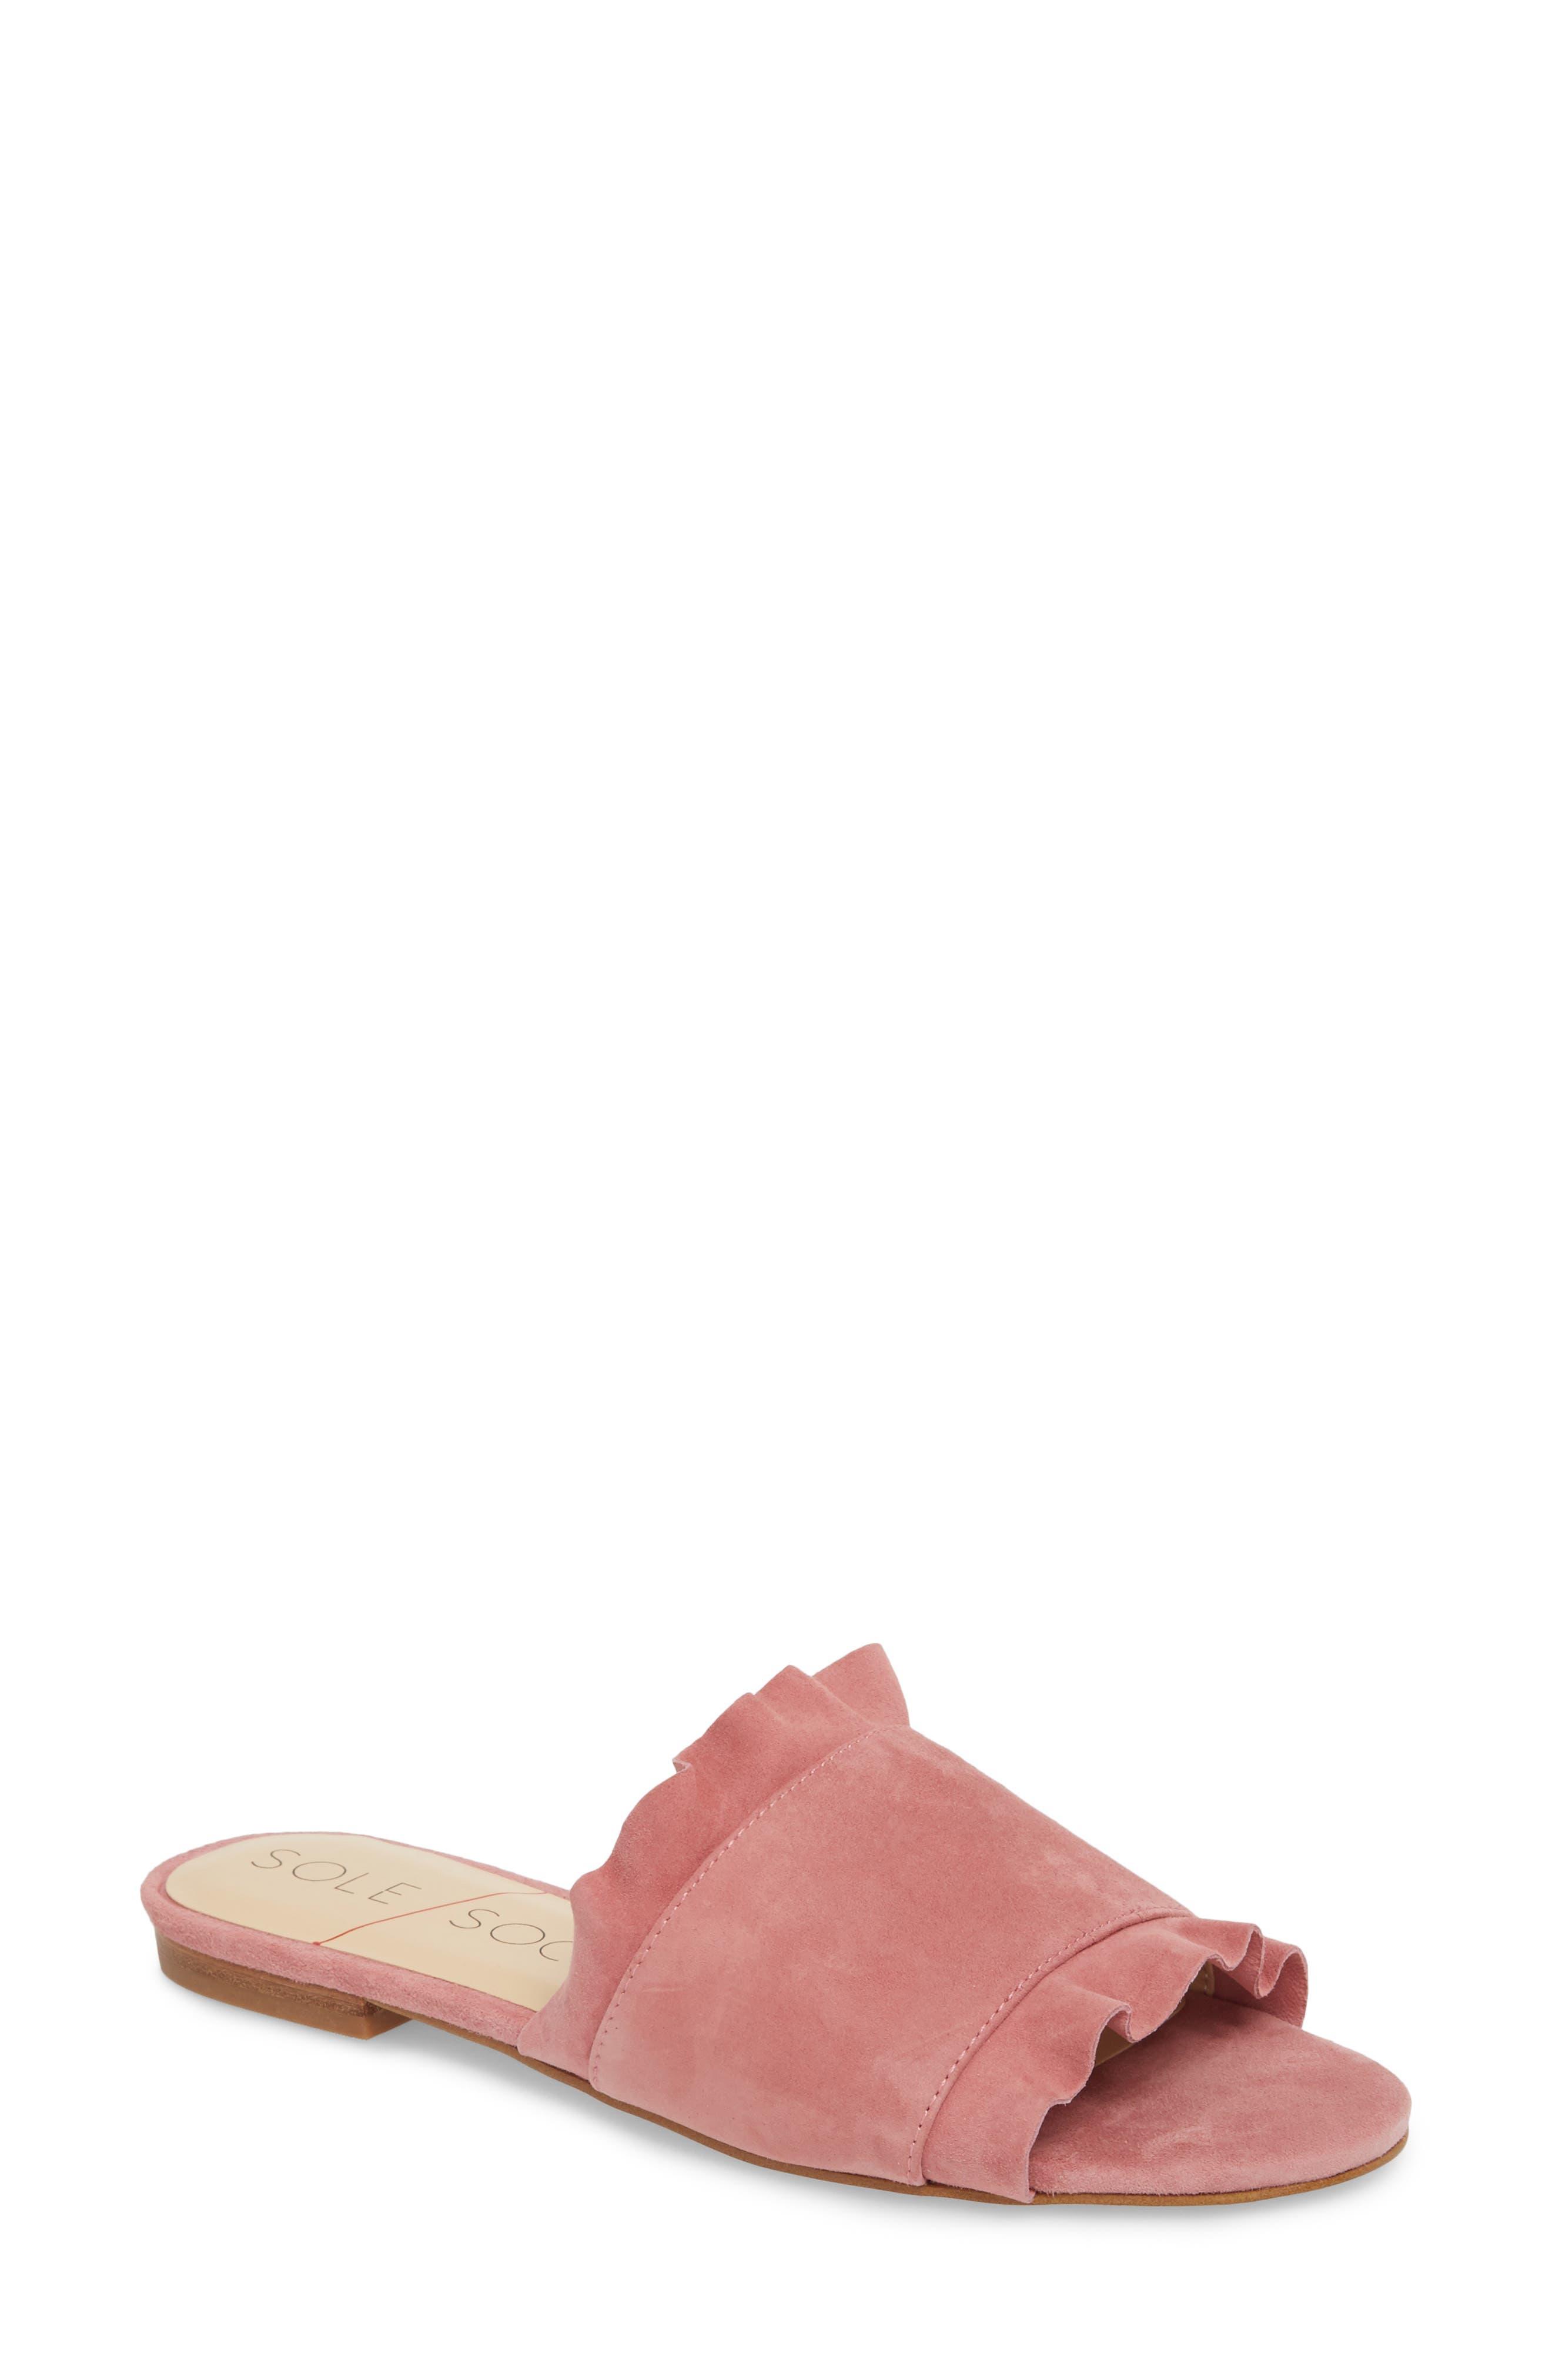 Sole Society So-Madalayne Flat Sandal- Pink